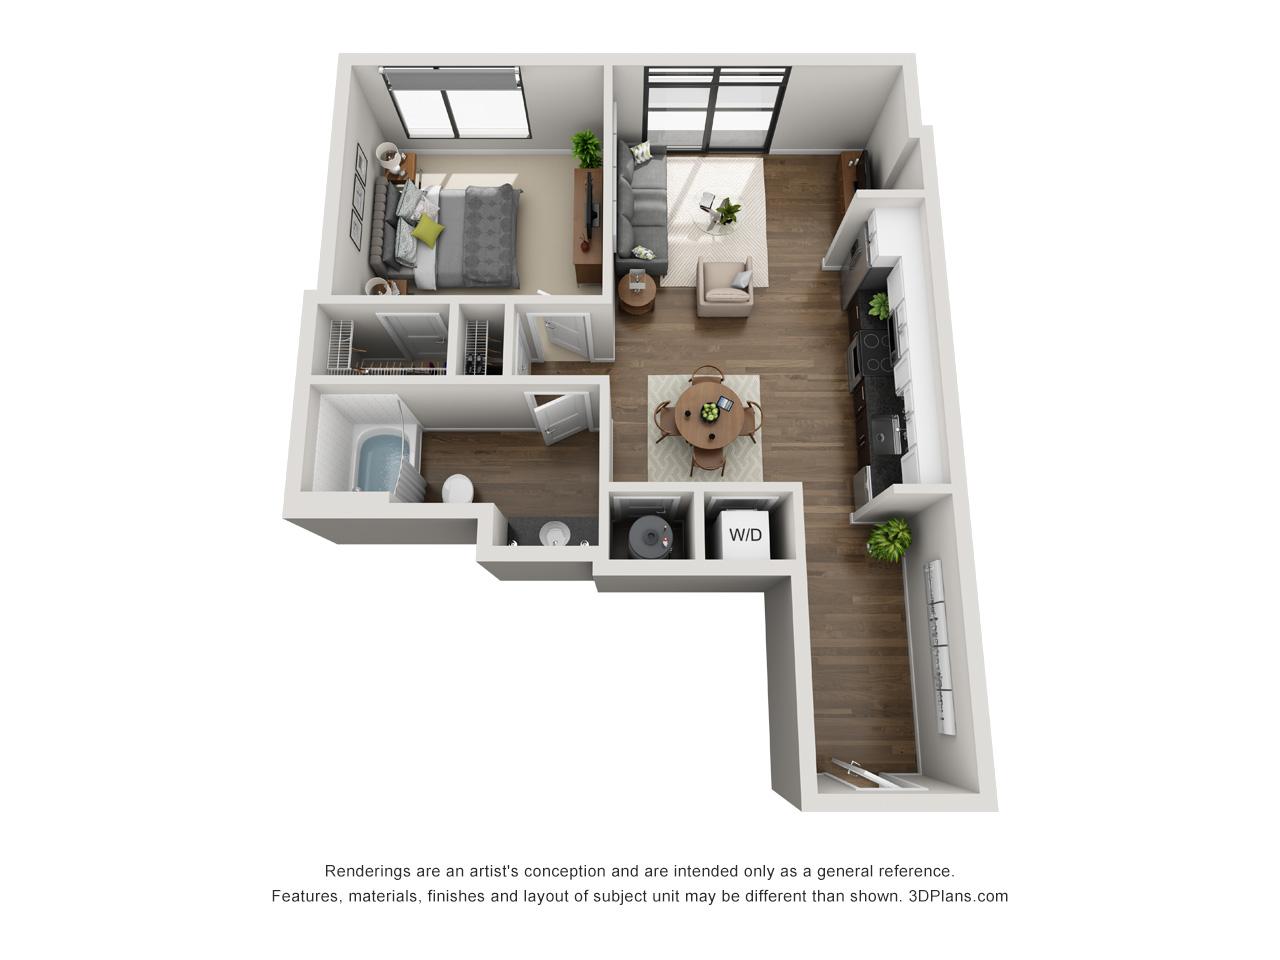 one bedroom apartment rental in nashville tn - 1 Bedroom Apartments In Tn